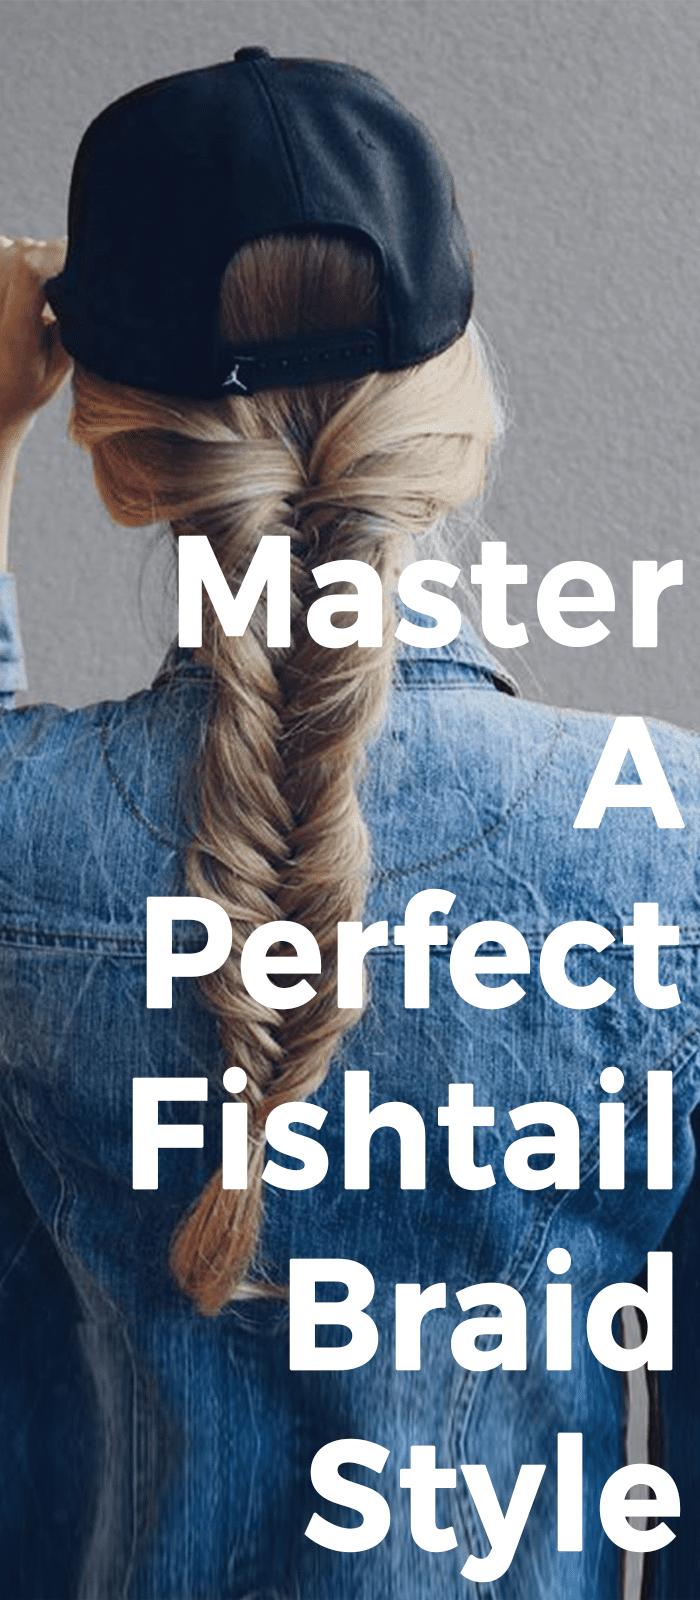 Master A Perfect Fishtail Braid!